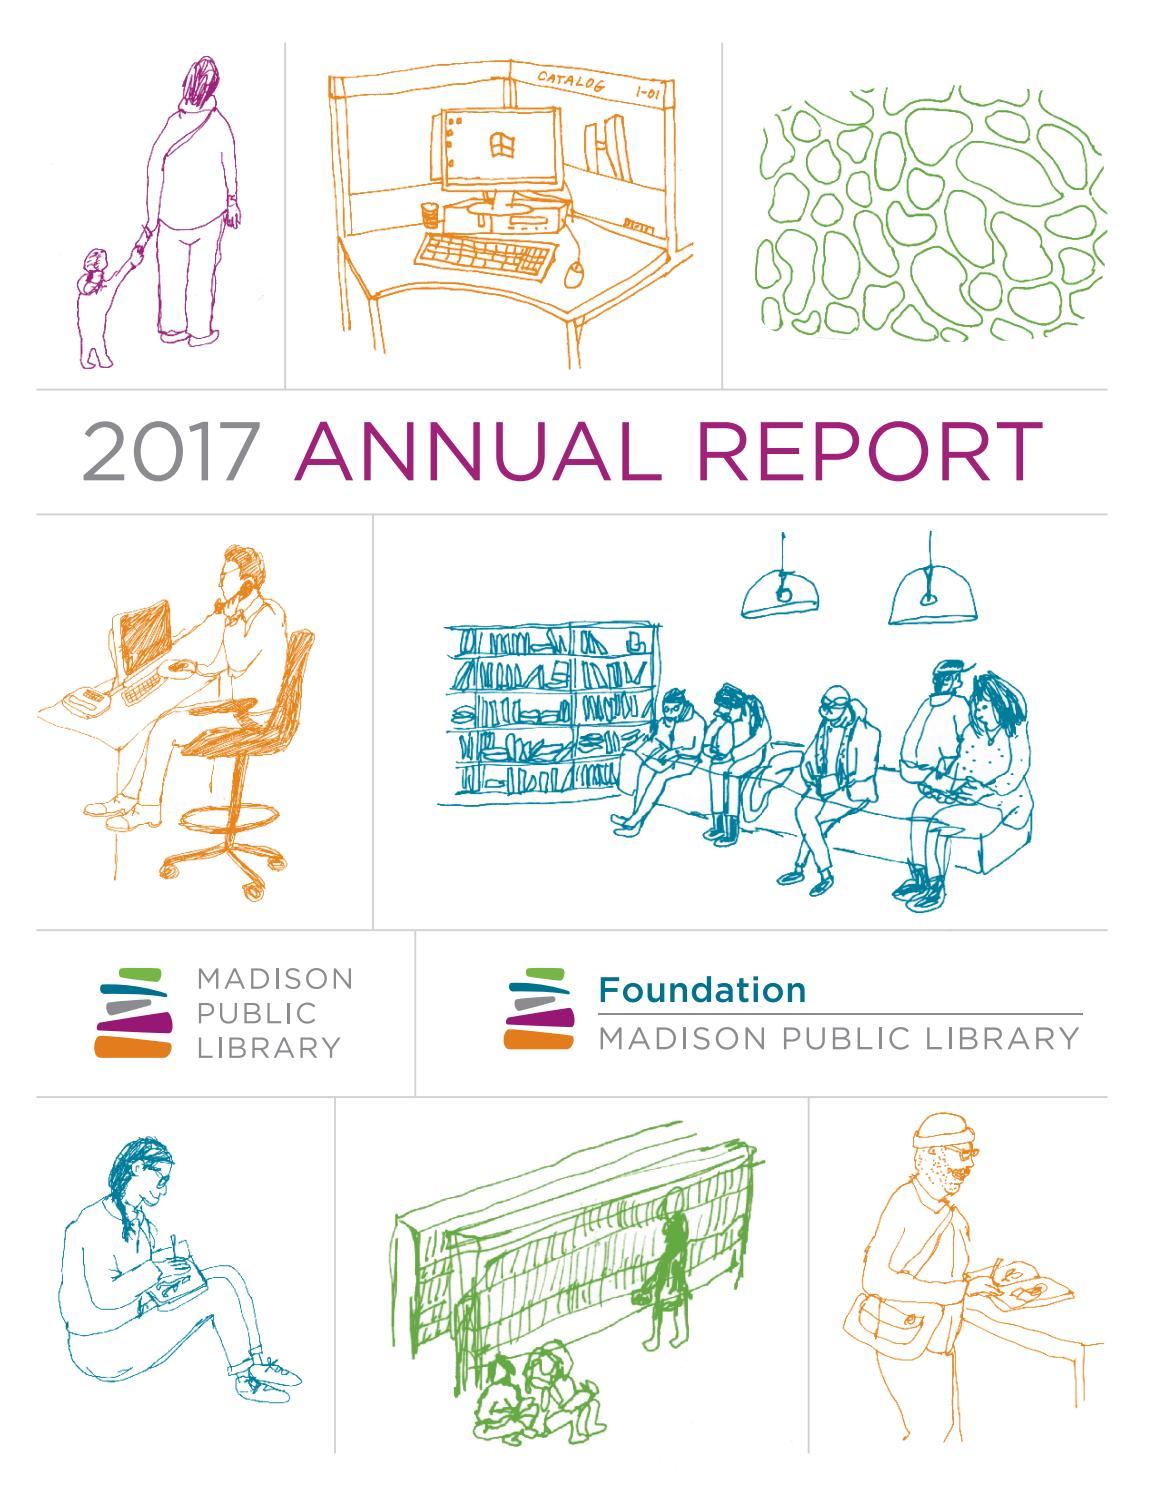 Madison Public Library & Madison Public Library Foundation